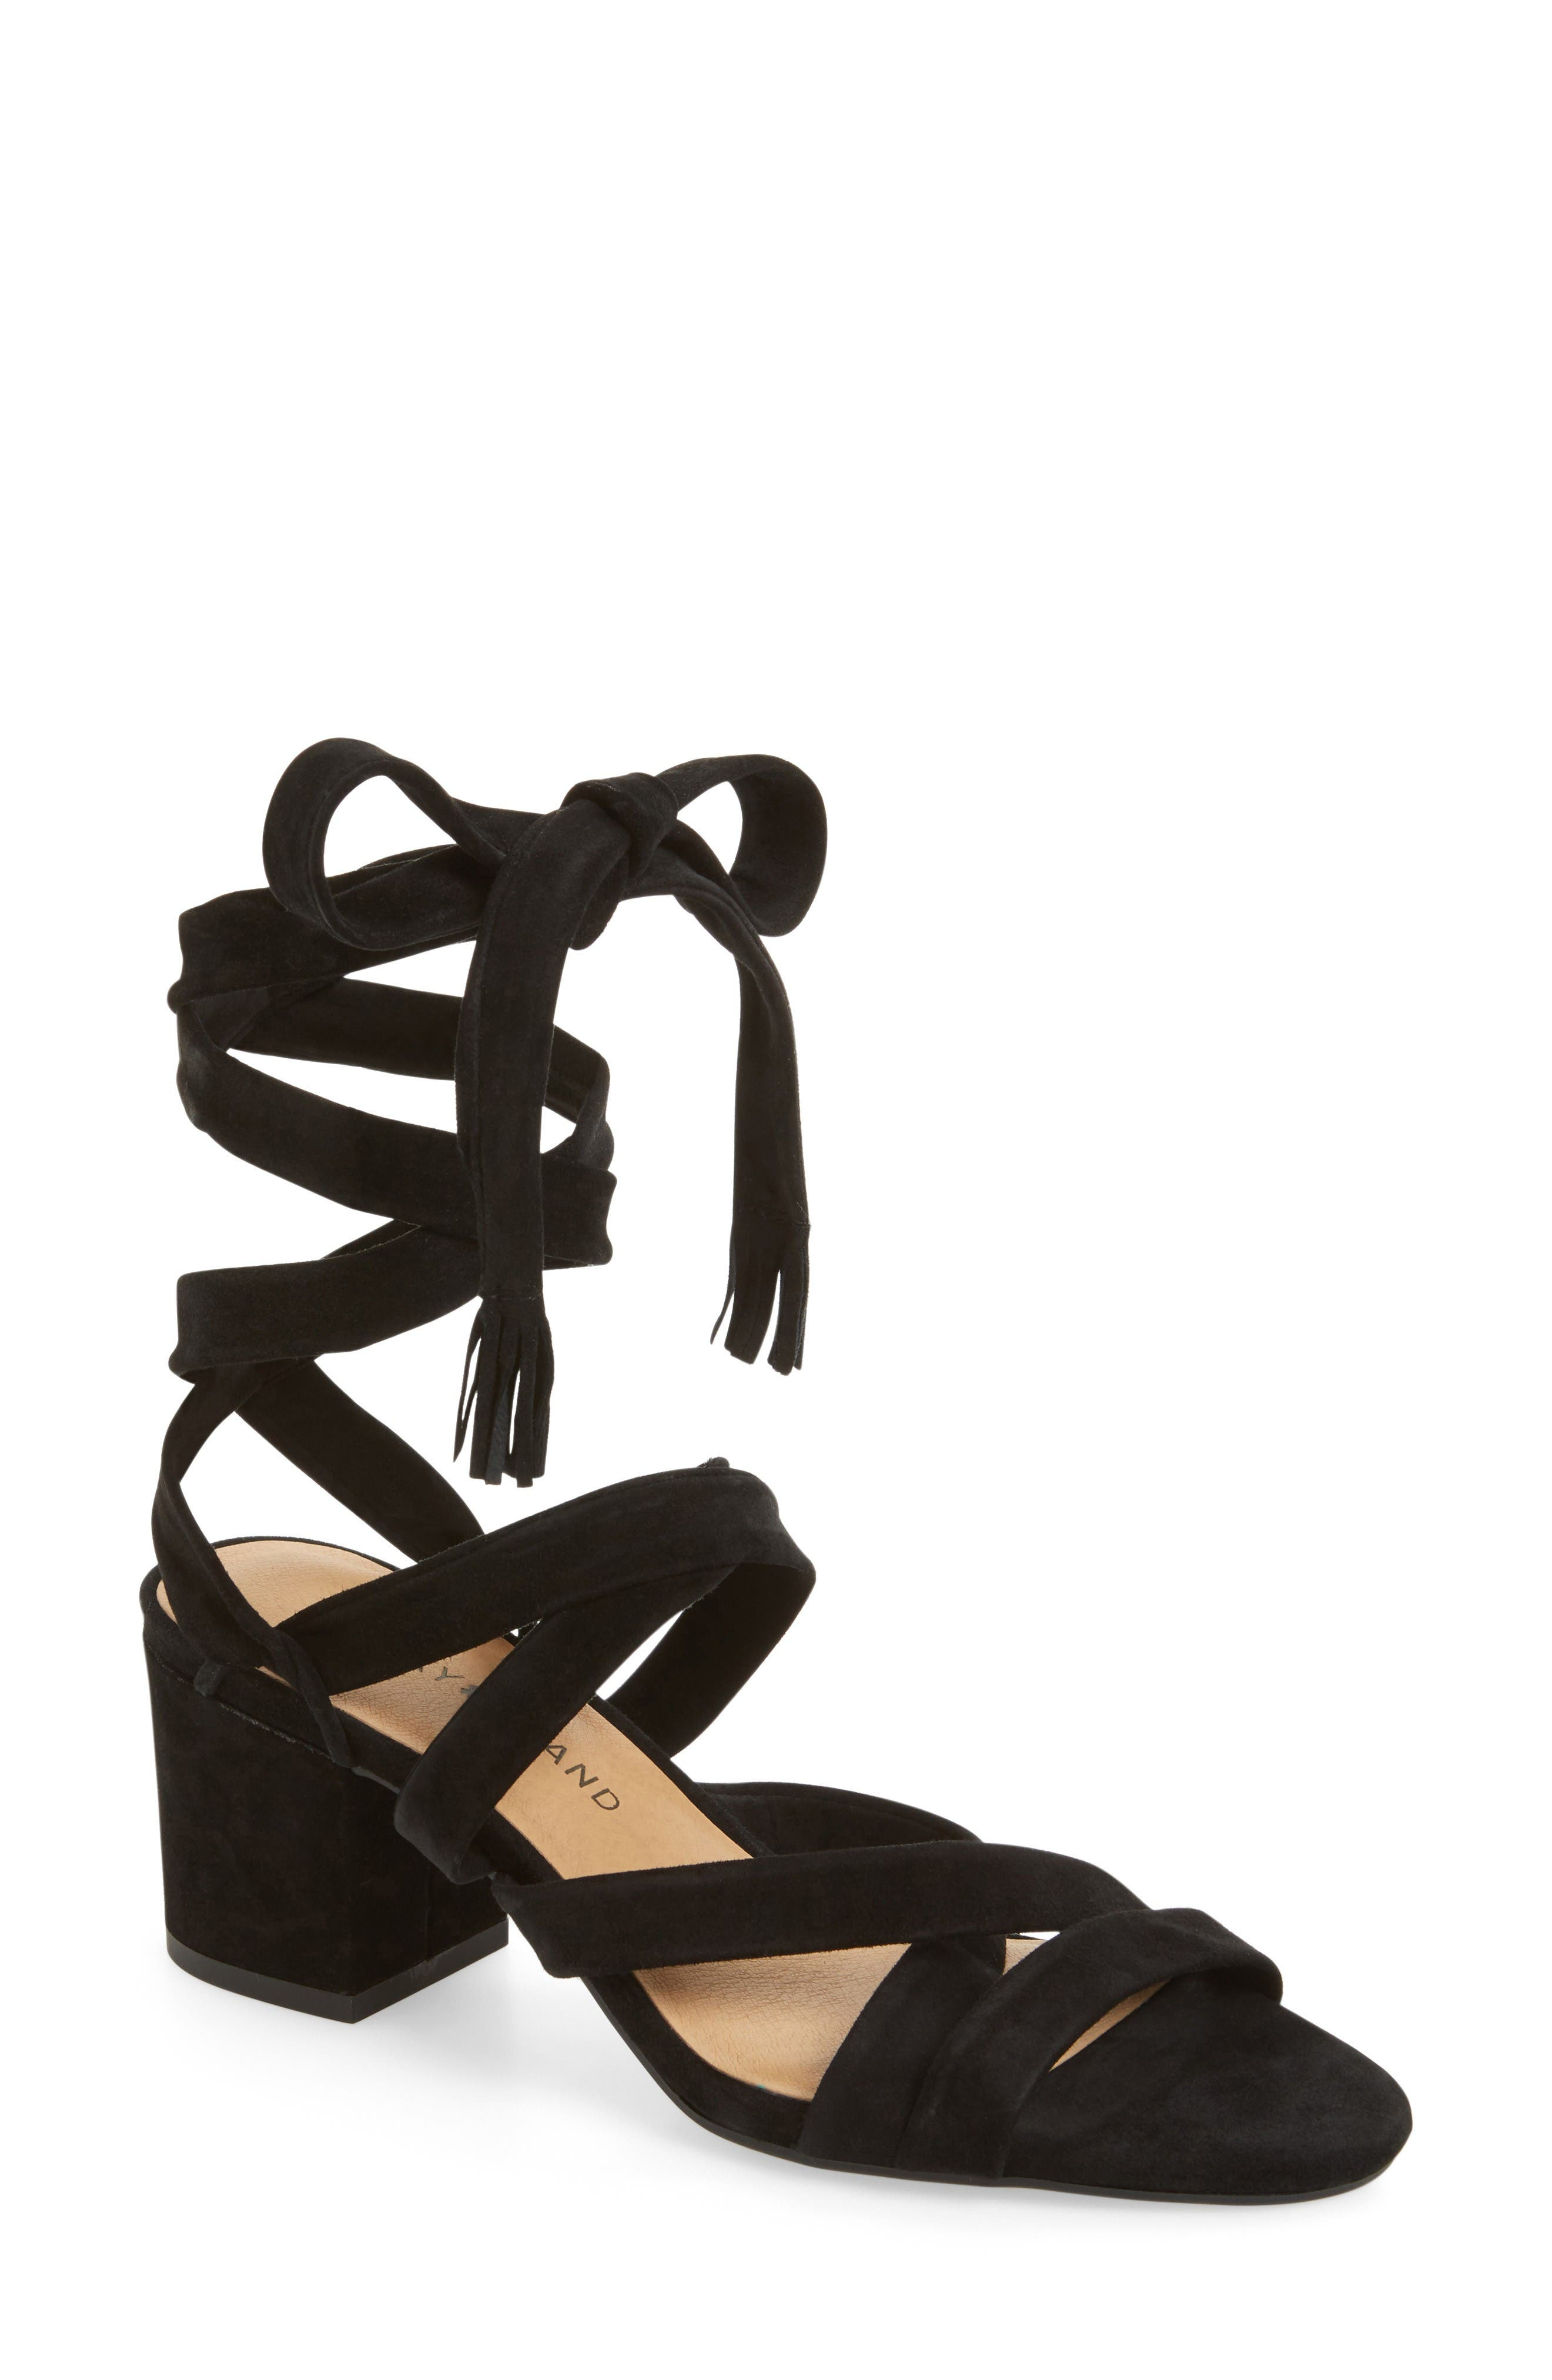 Main Image - Lucky Brand Idalina Block Heel Sandal (Women)